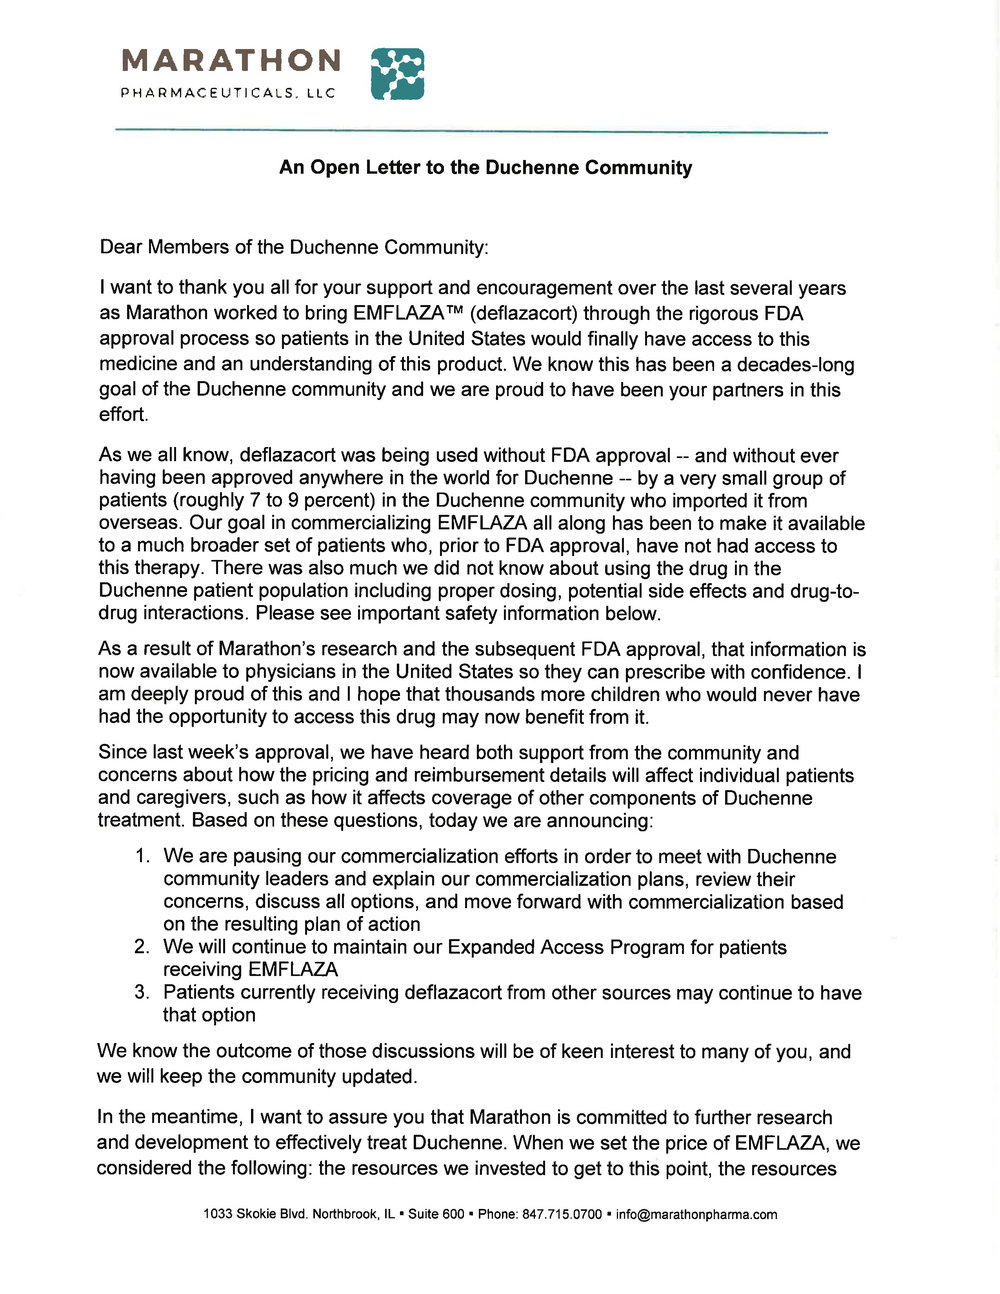 open_letter_dmd_community_Page_1.jpg